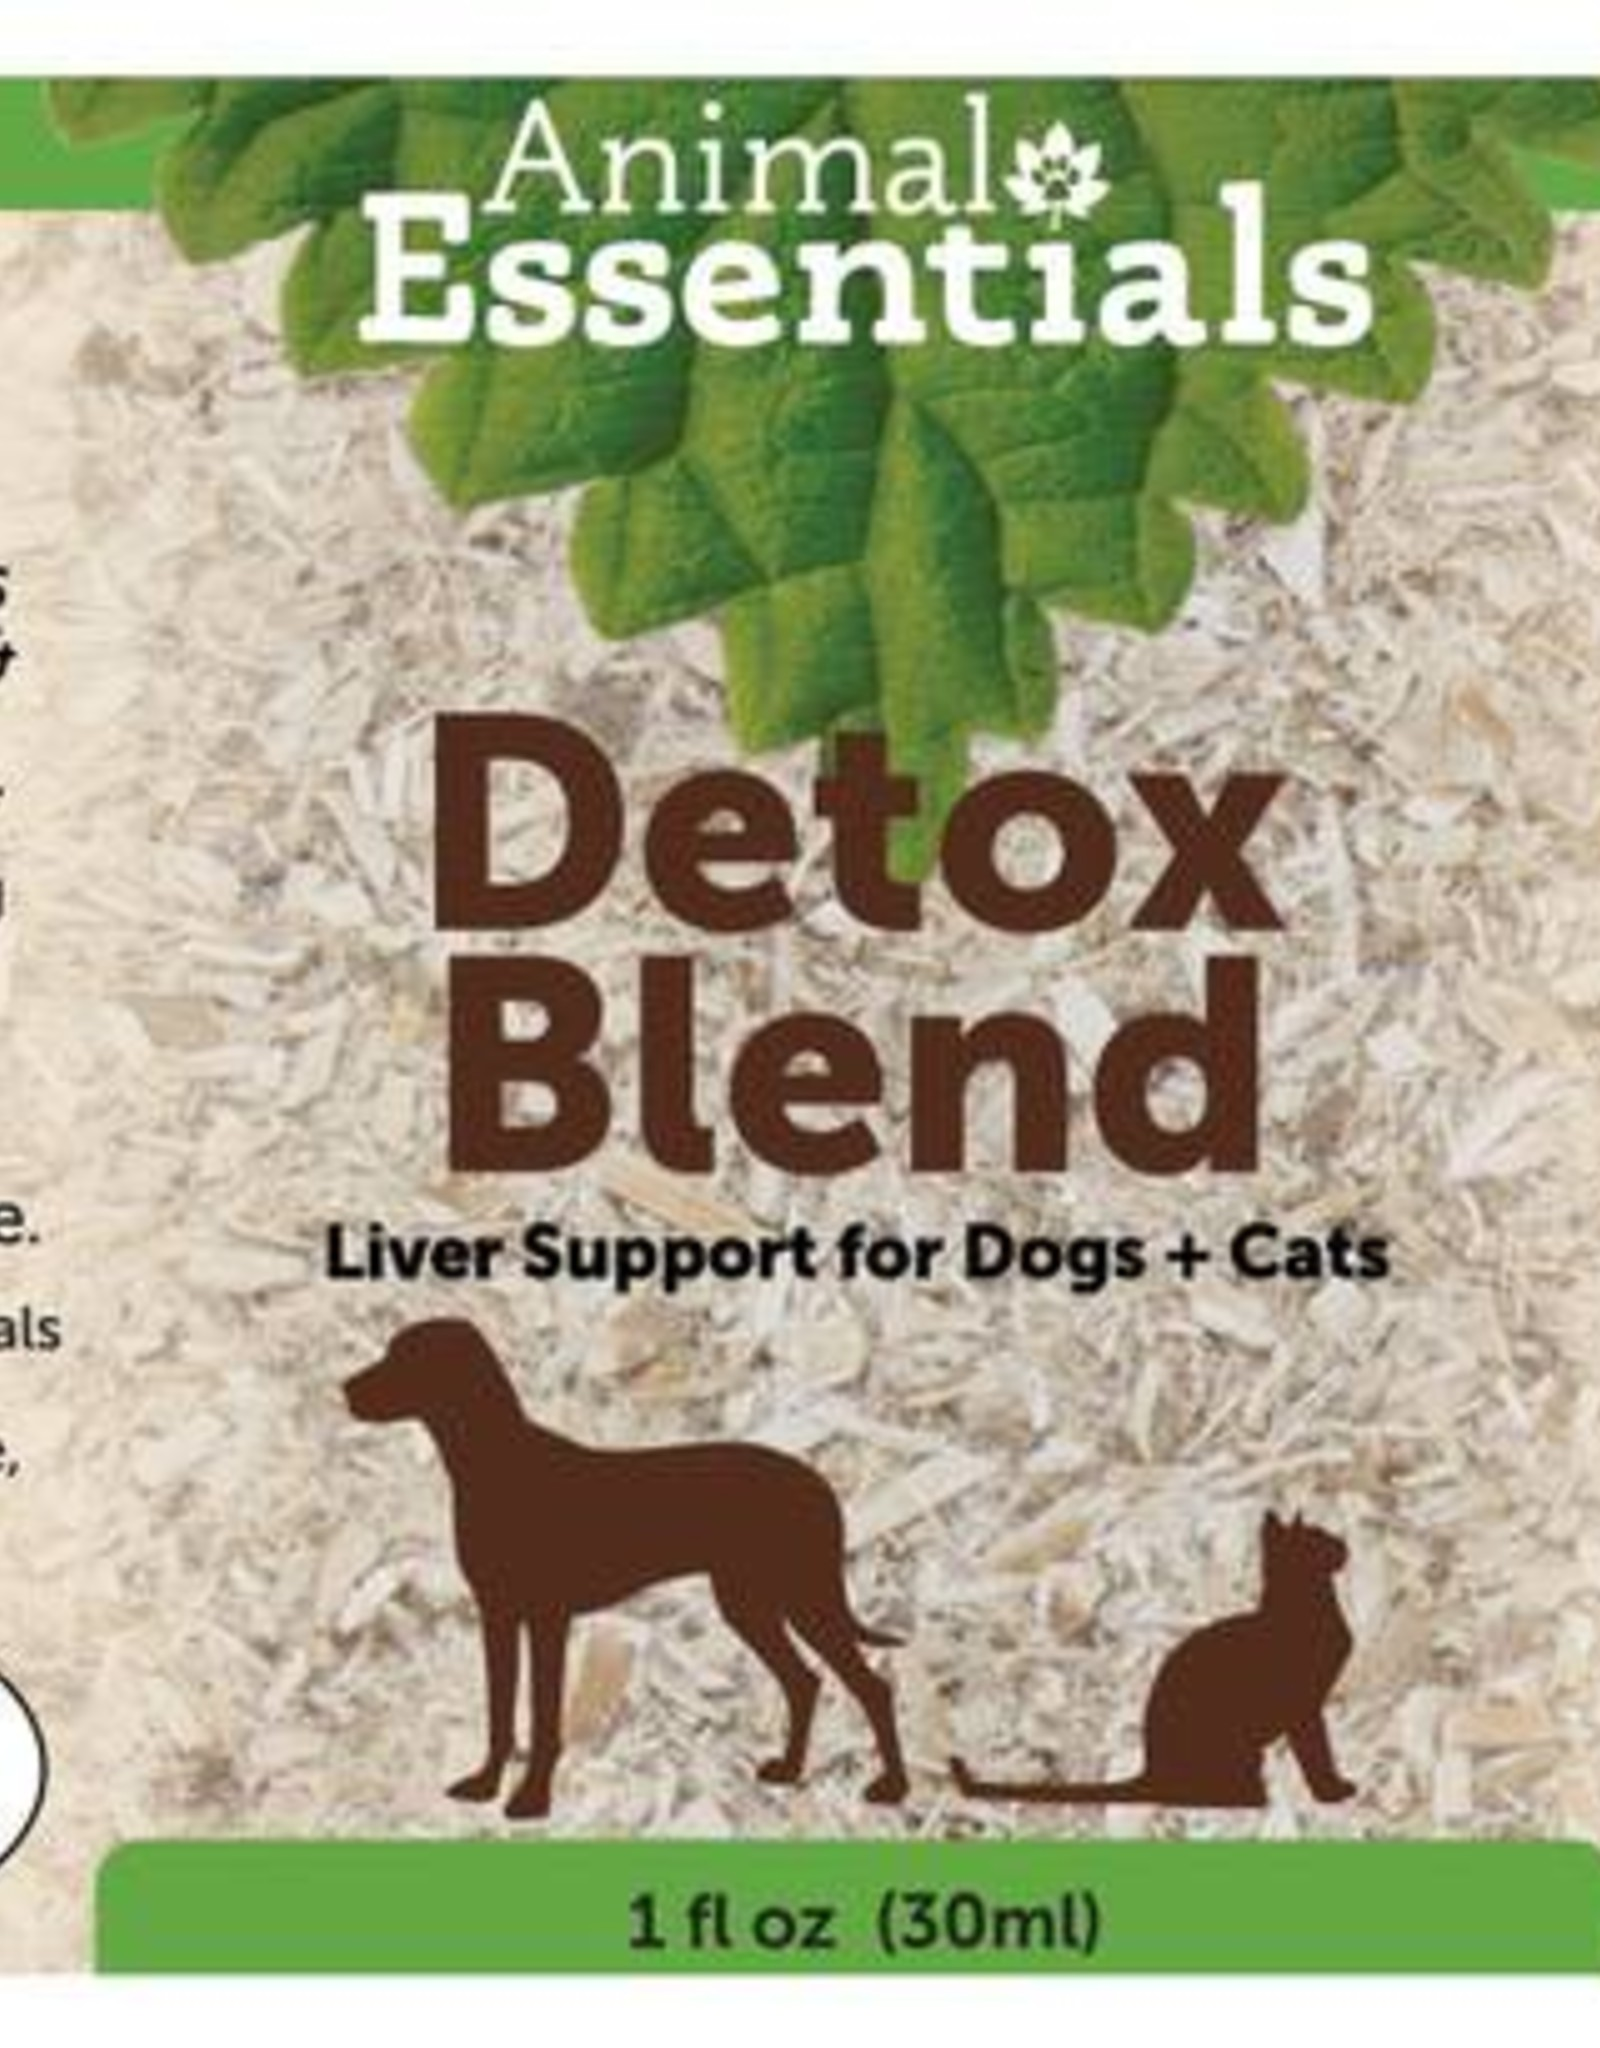 Animal Essentials Animal Essentials Detox Blend 1oz